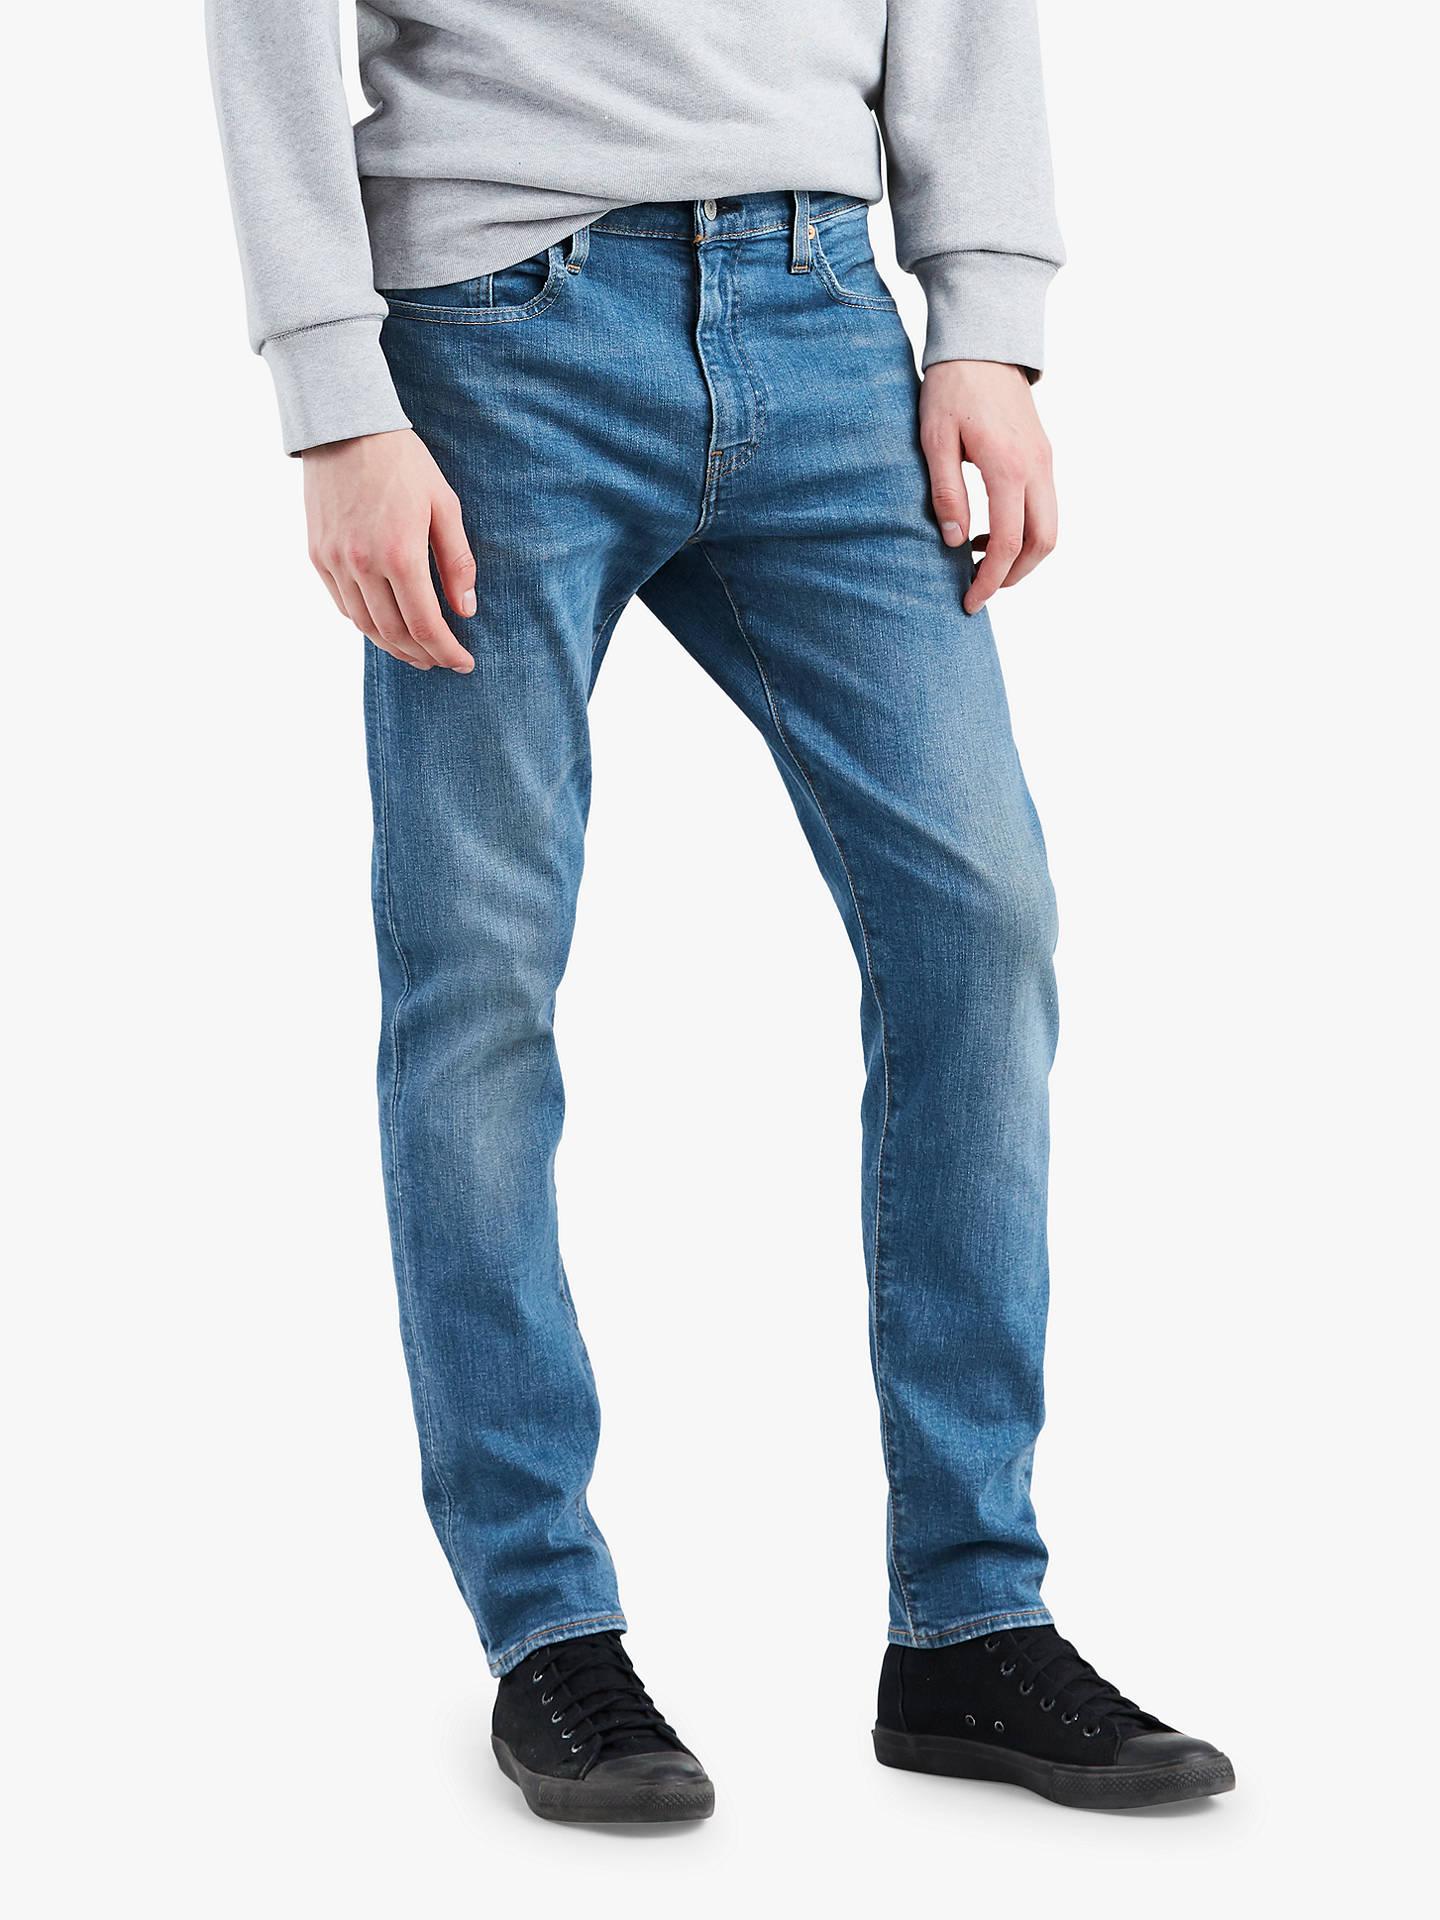 de7819a07fb Buy Levi's 512 Slim Tapered Jeans, Four Leaf Clover, 30S Online at  johnlewis.